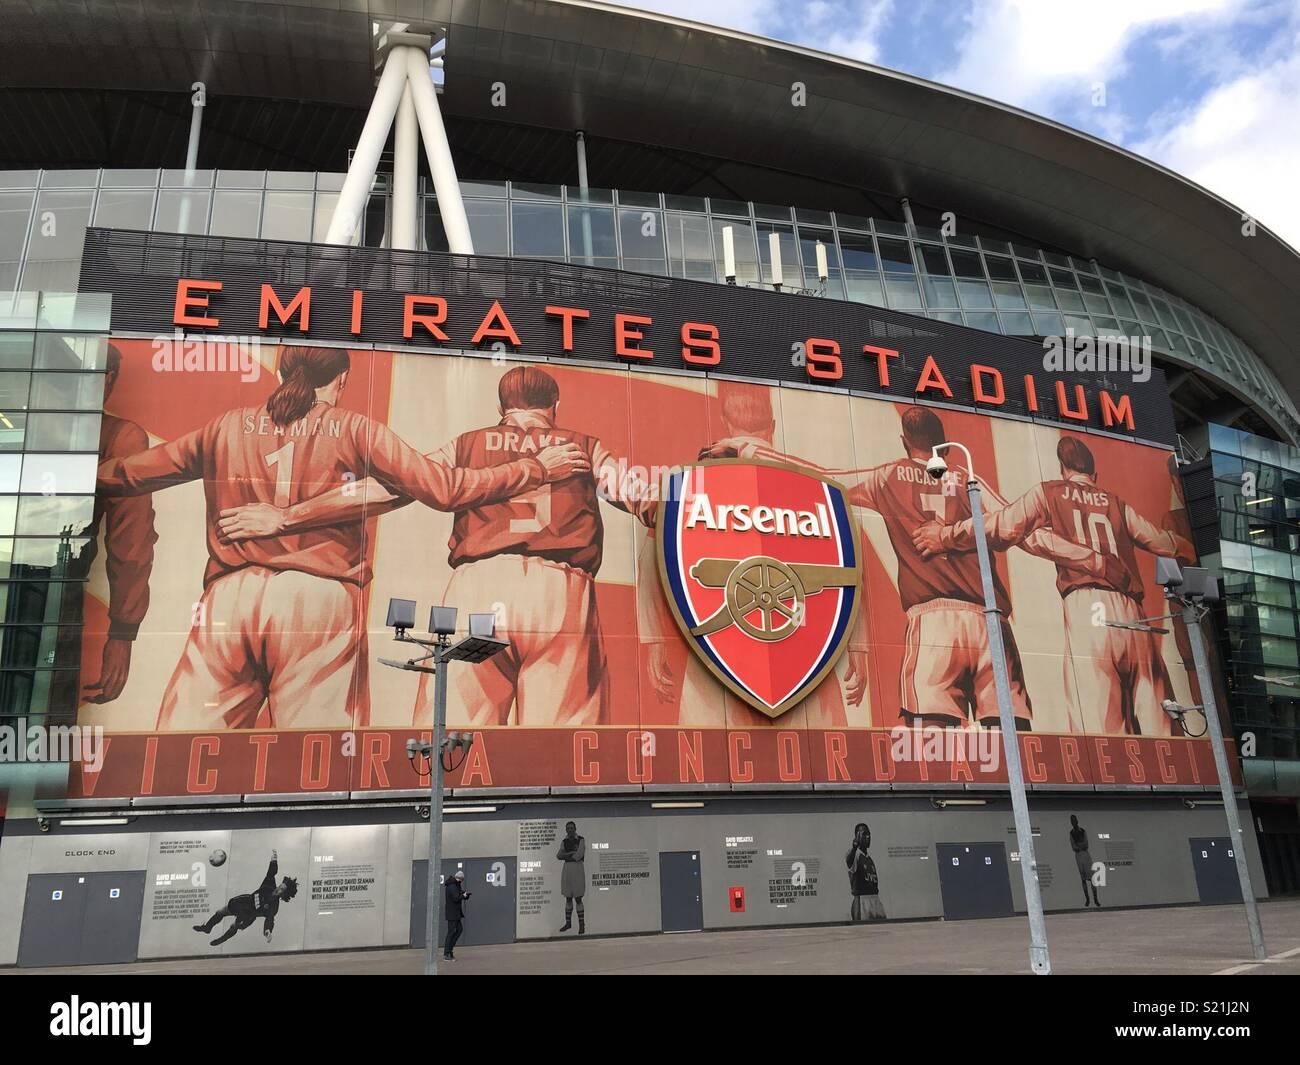 Emirates stadium - Stock Image